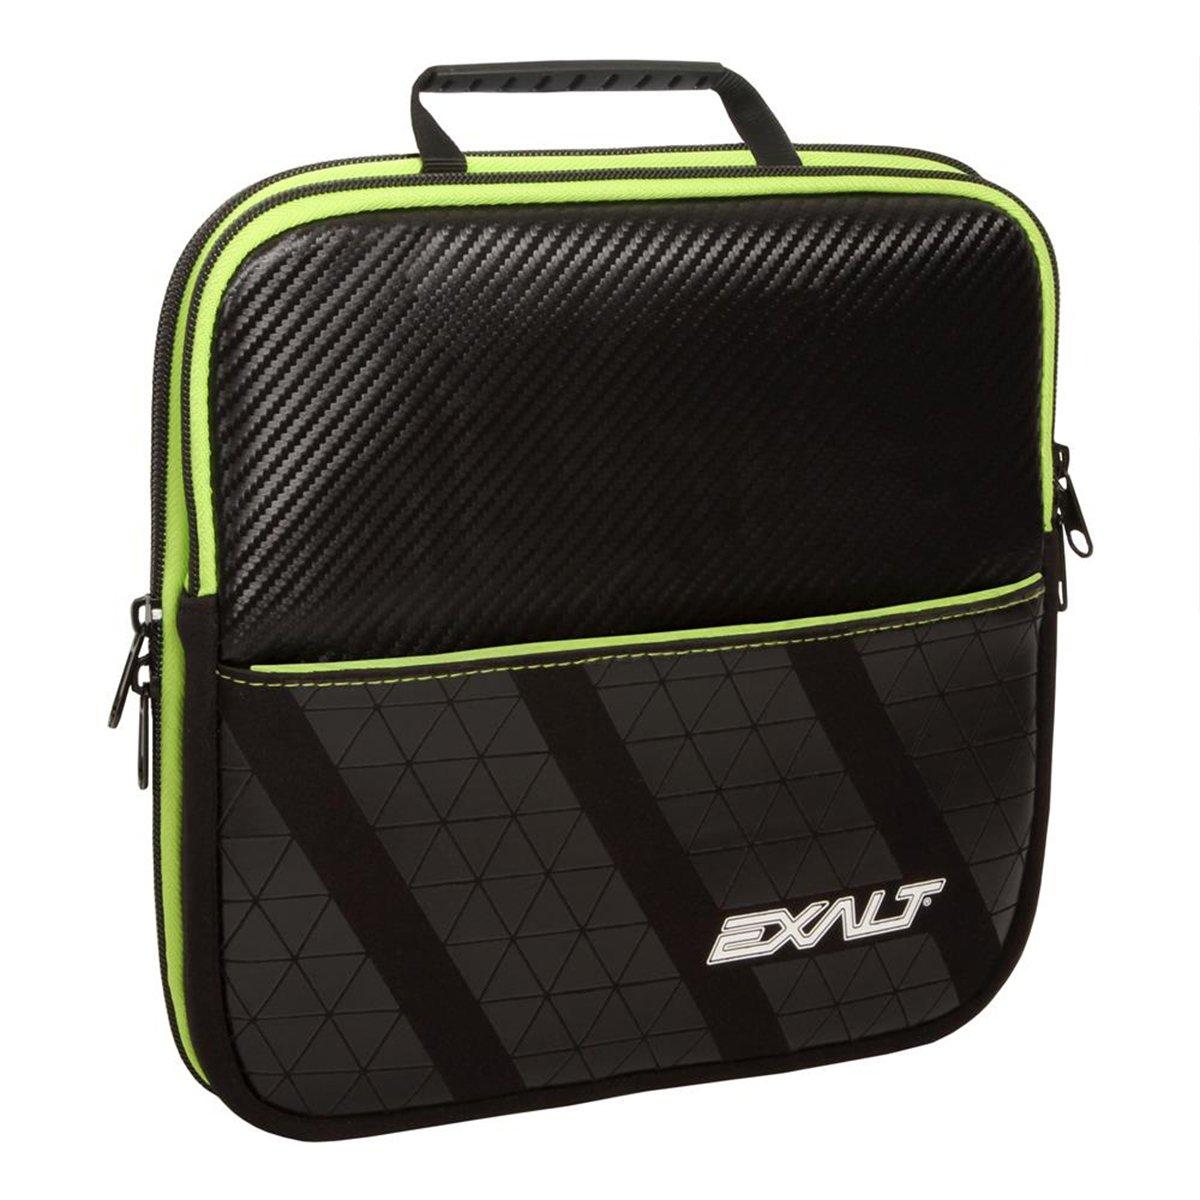 Exalt Paintball Marker Bag by Exalt